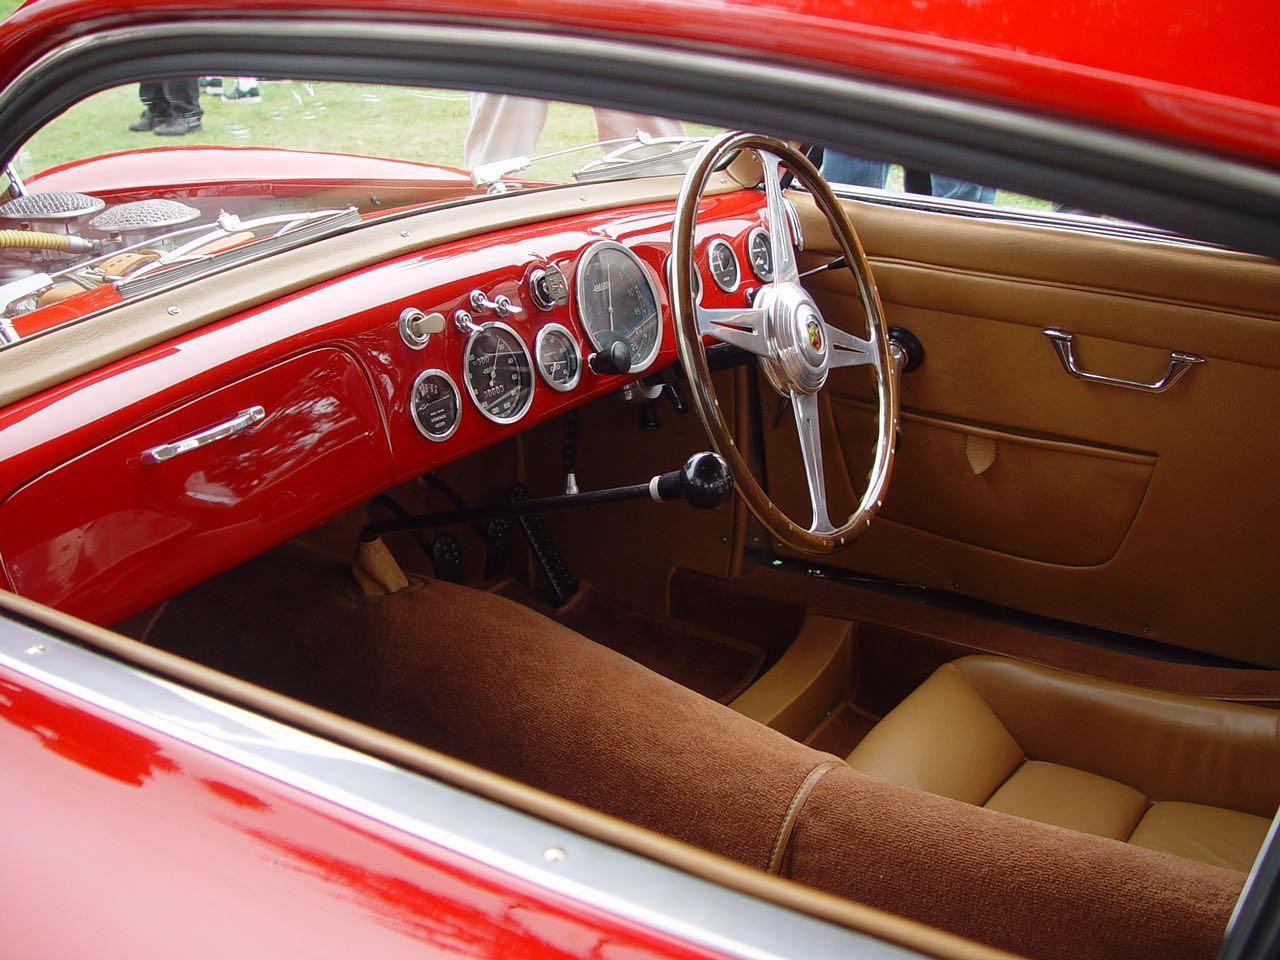 '51 Abarth 204 Berlinetta Corsa & 205 Berlinetta GT - Sublissima 7